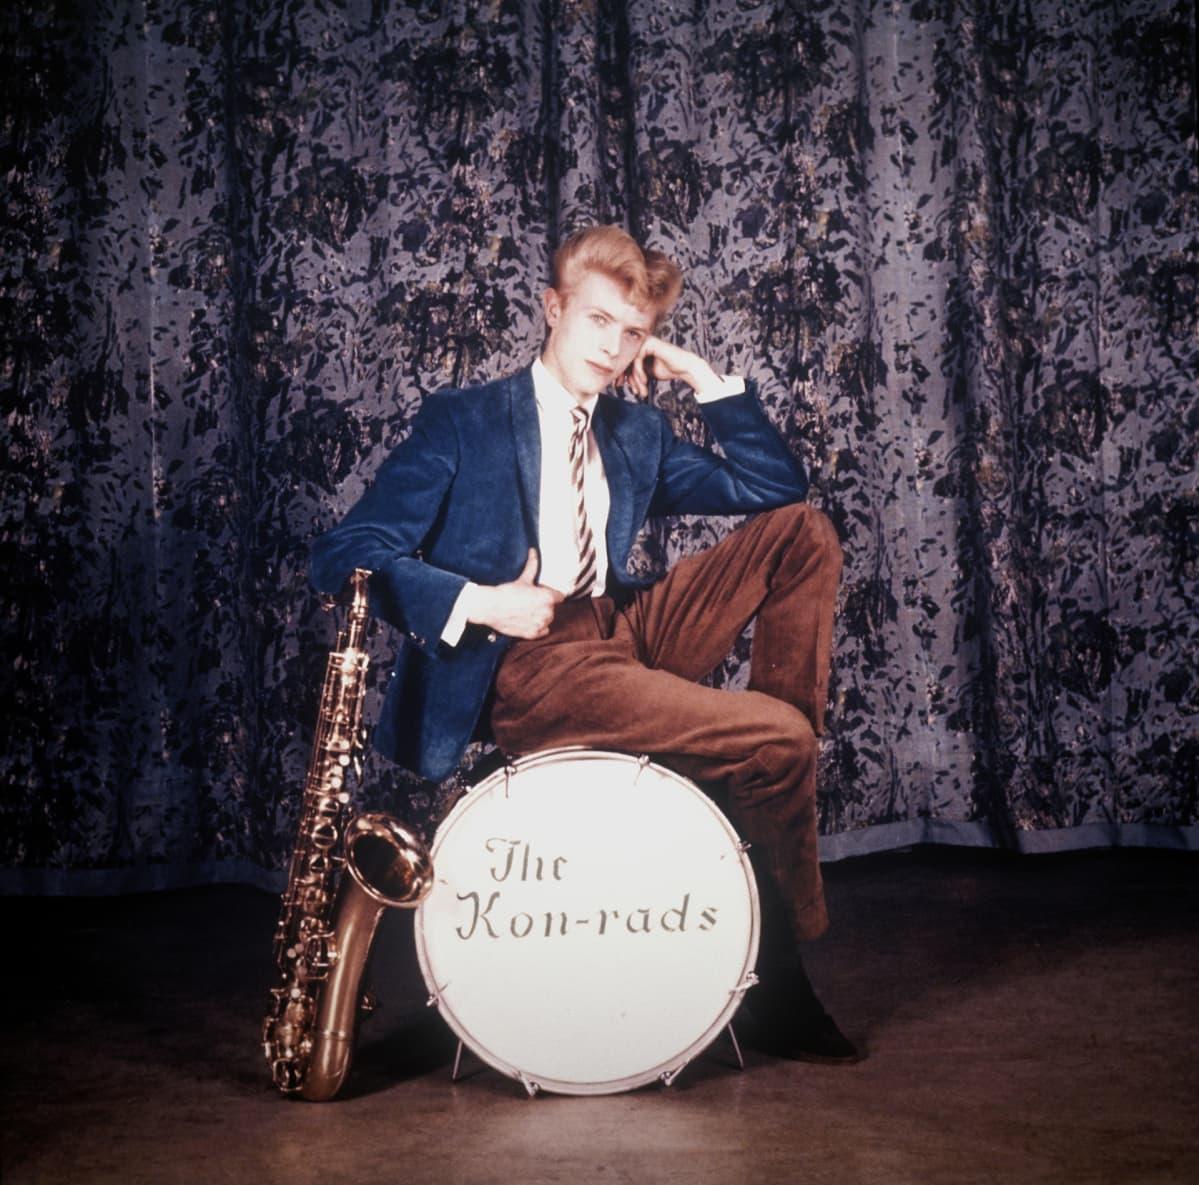 David Bowie The Konrads-yhtyeen saksofonistina noin vuonna 1962.